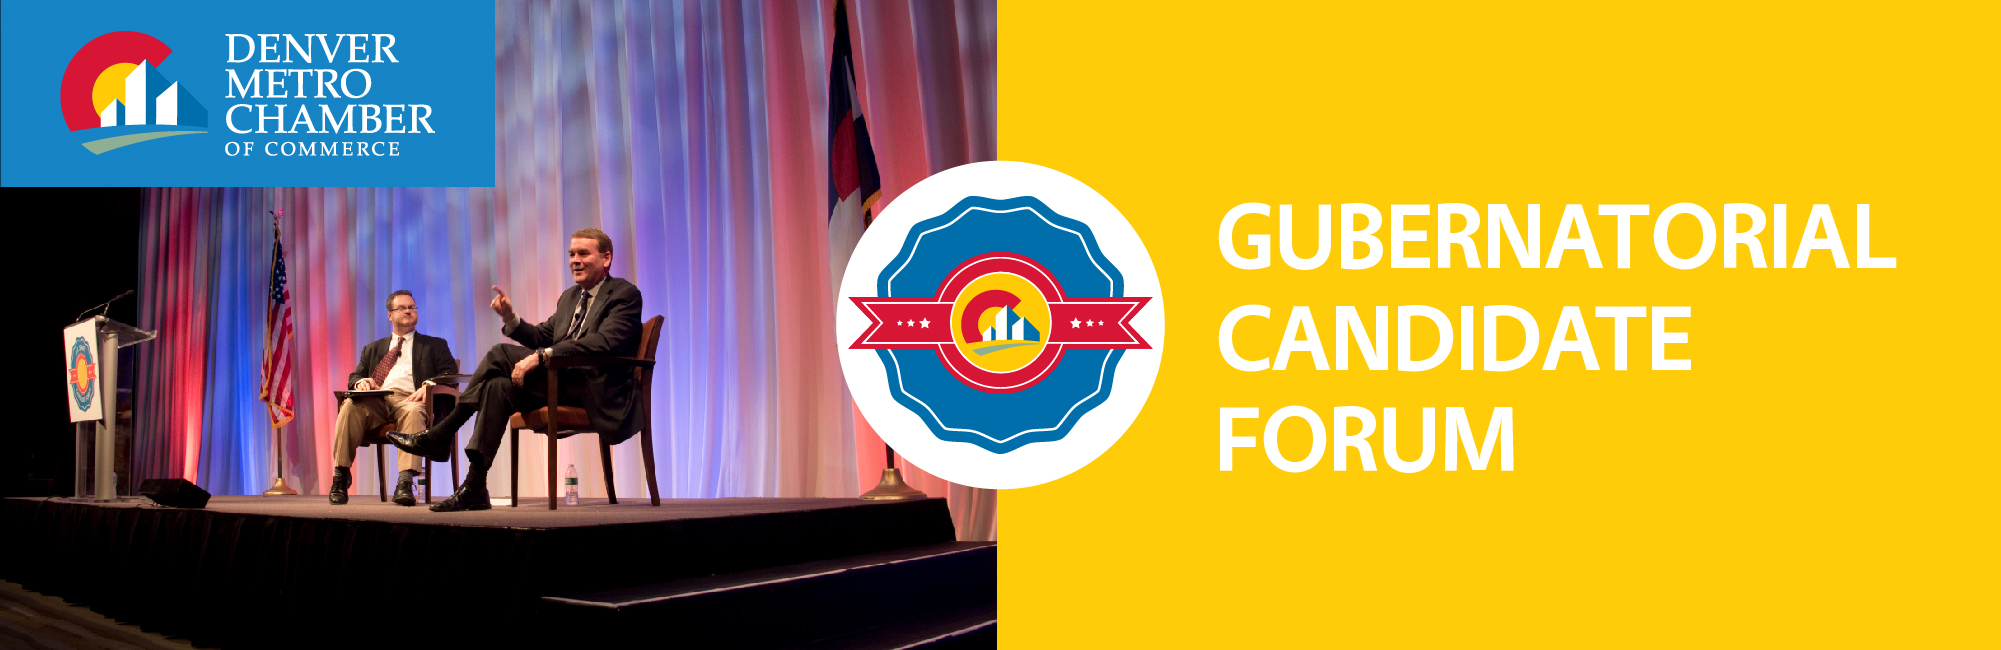 2018 Gubernatorial Candidate Forum